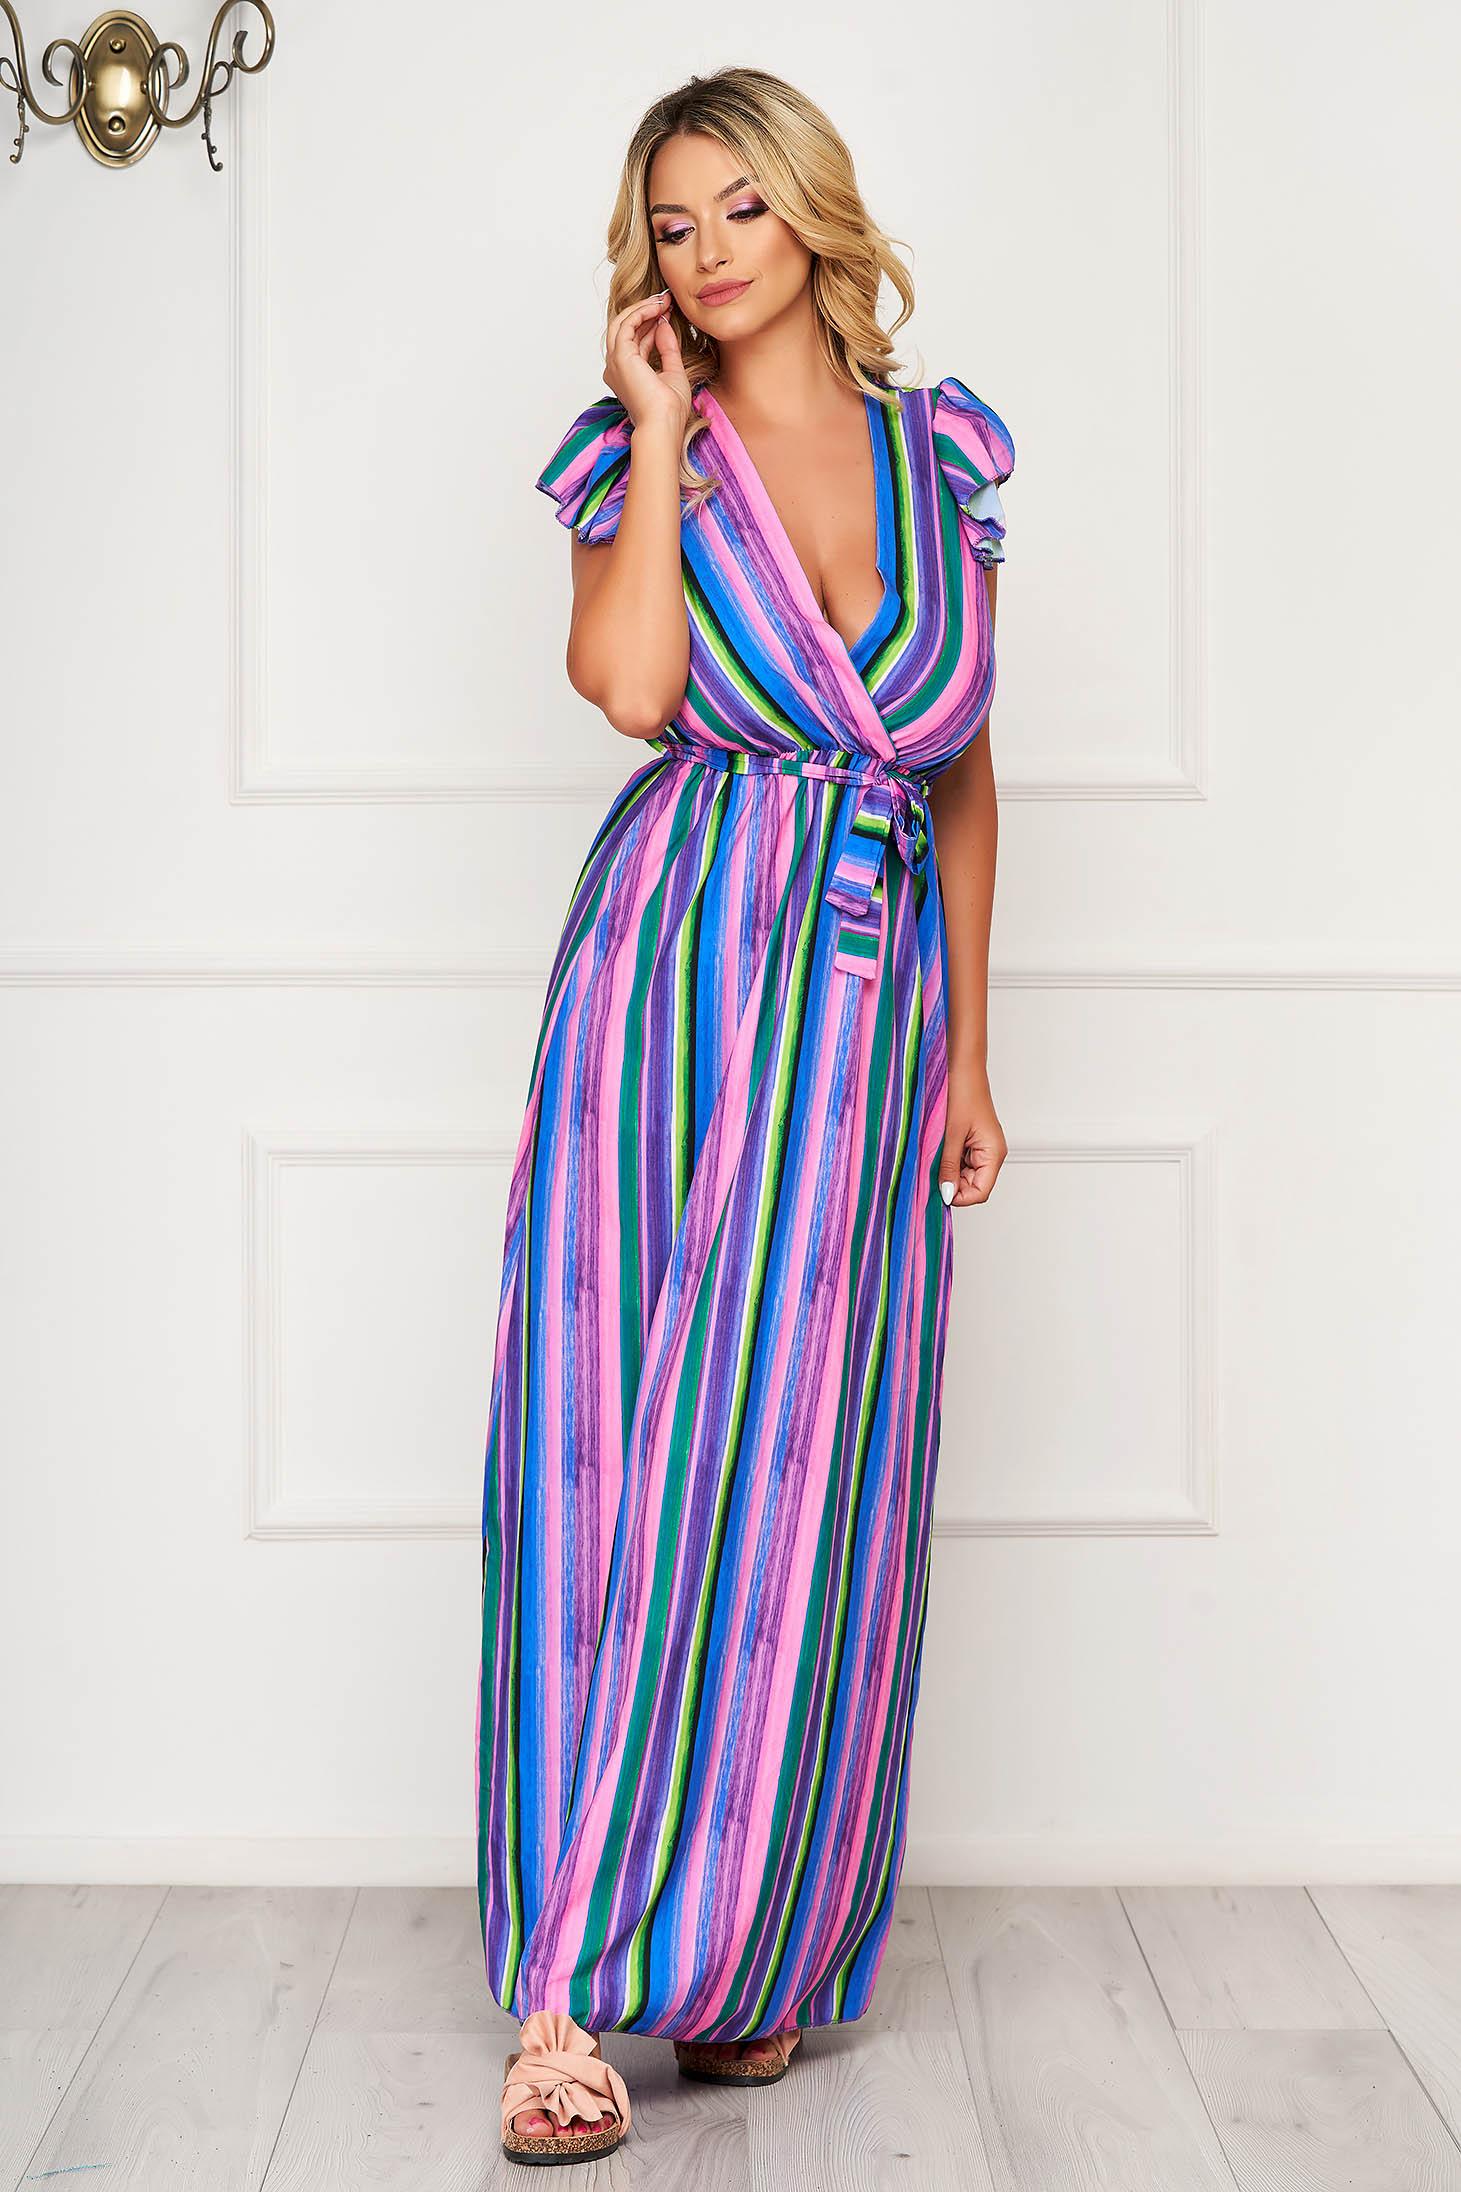 Rochie multicolora lunga de zi din material subtire cu elastic in talie